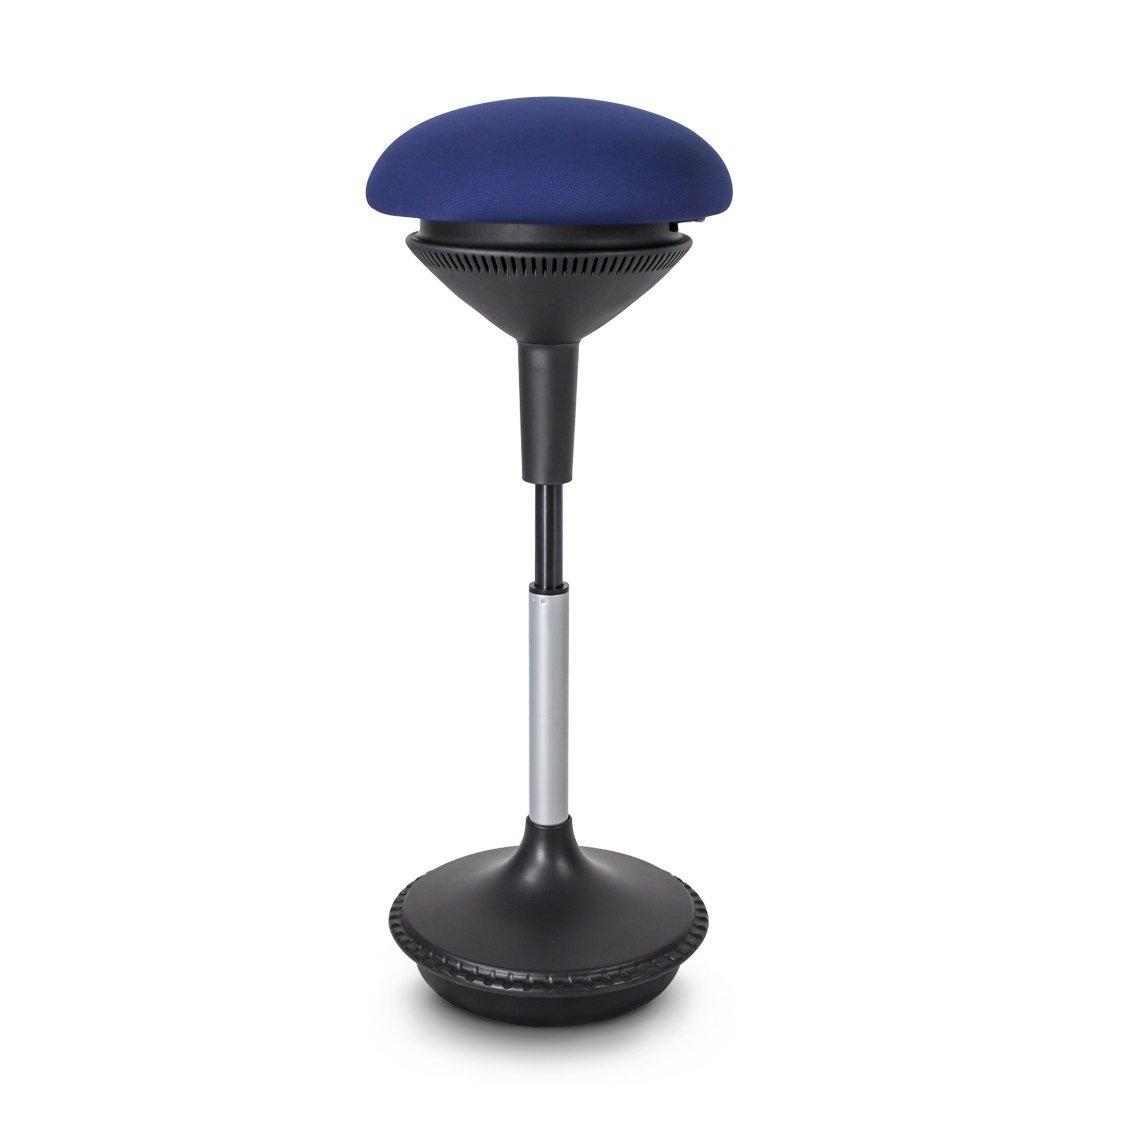 Balancing Adjustable Height Ergostool - Blue by DVG